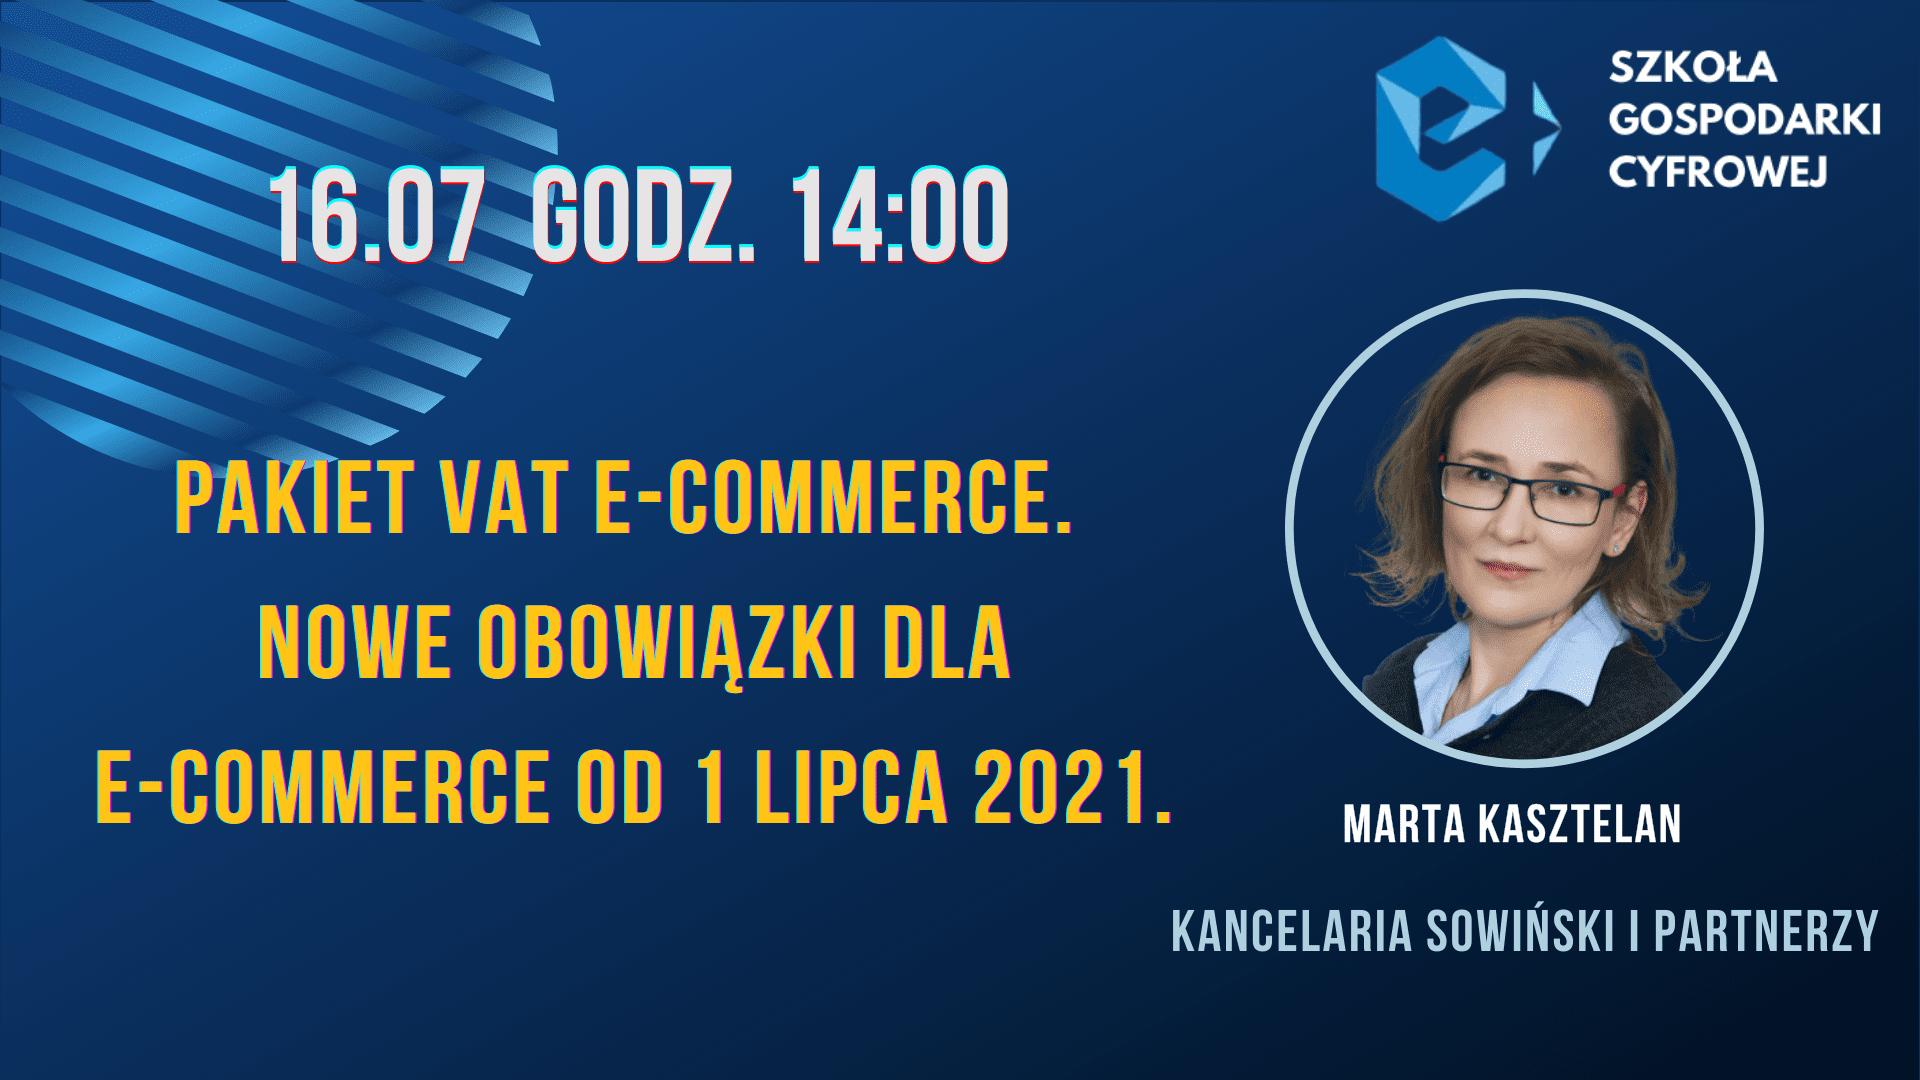 Pakiet vat e-commerce. Nowe obowiązki względem e-commerce od 1 lipca 2021.